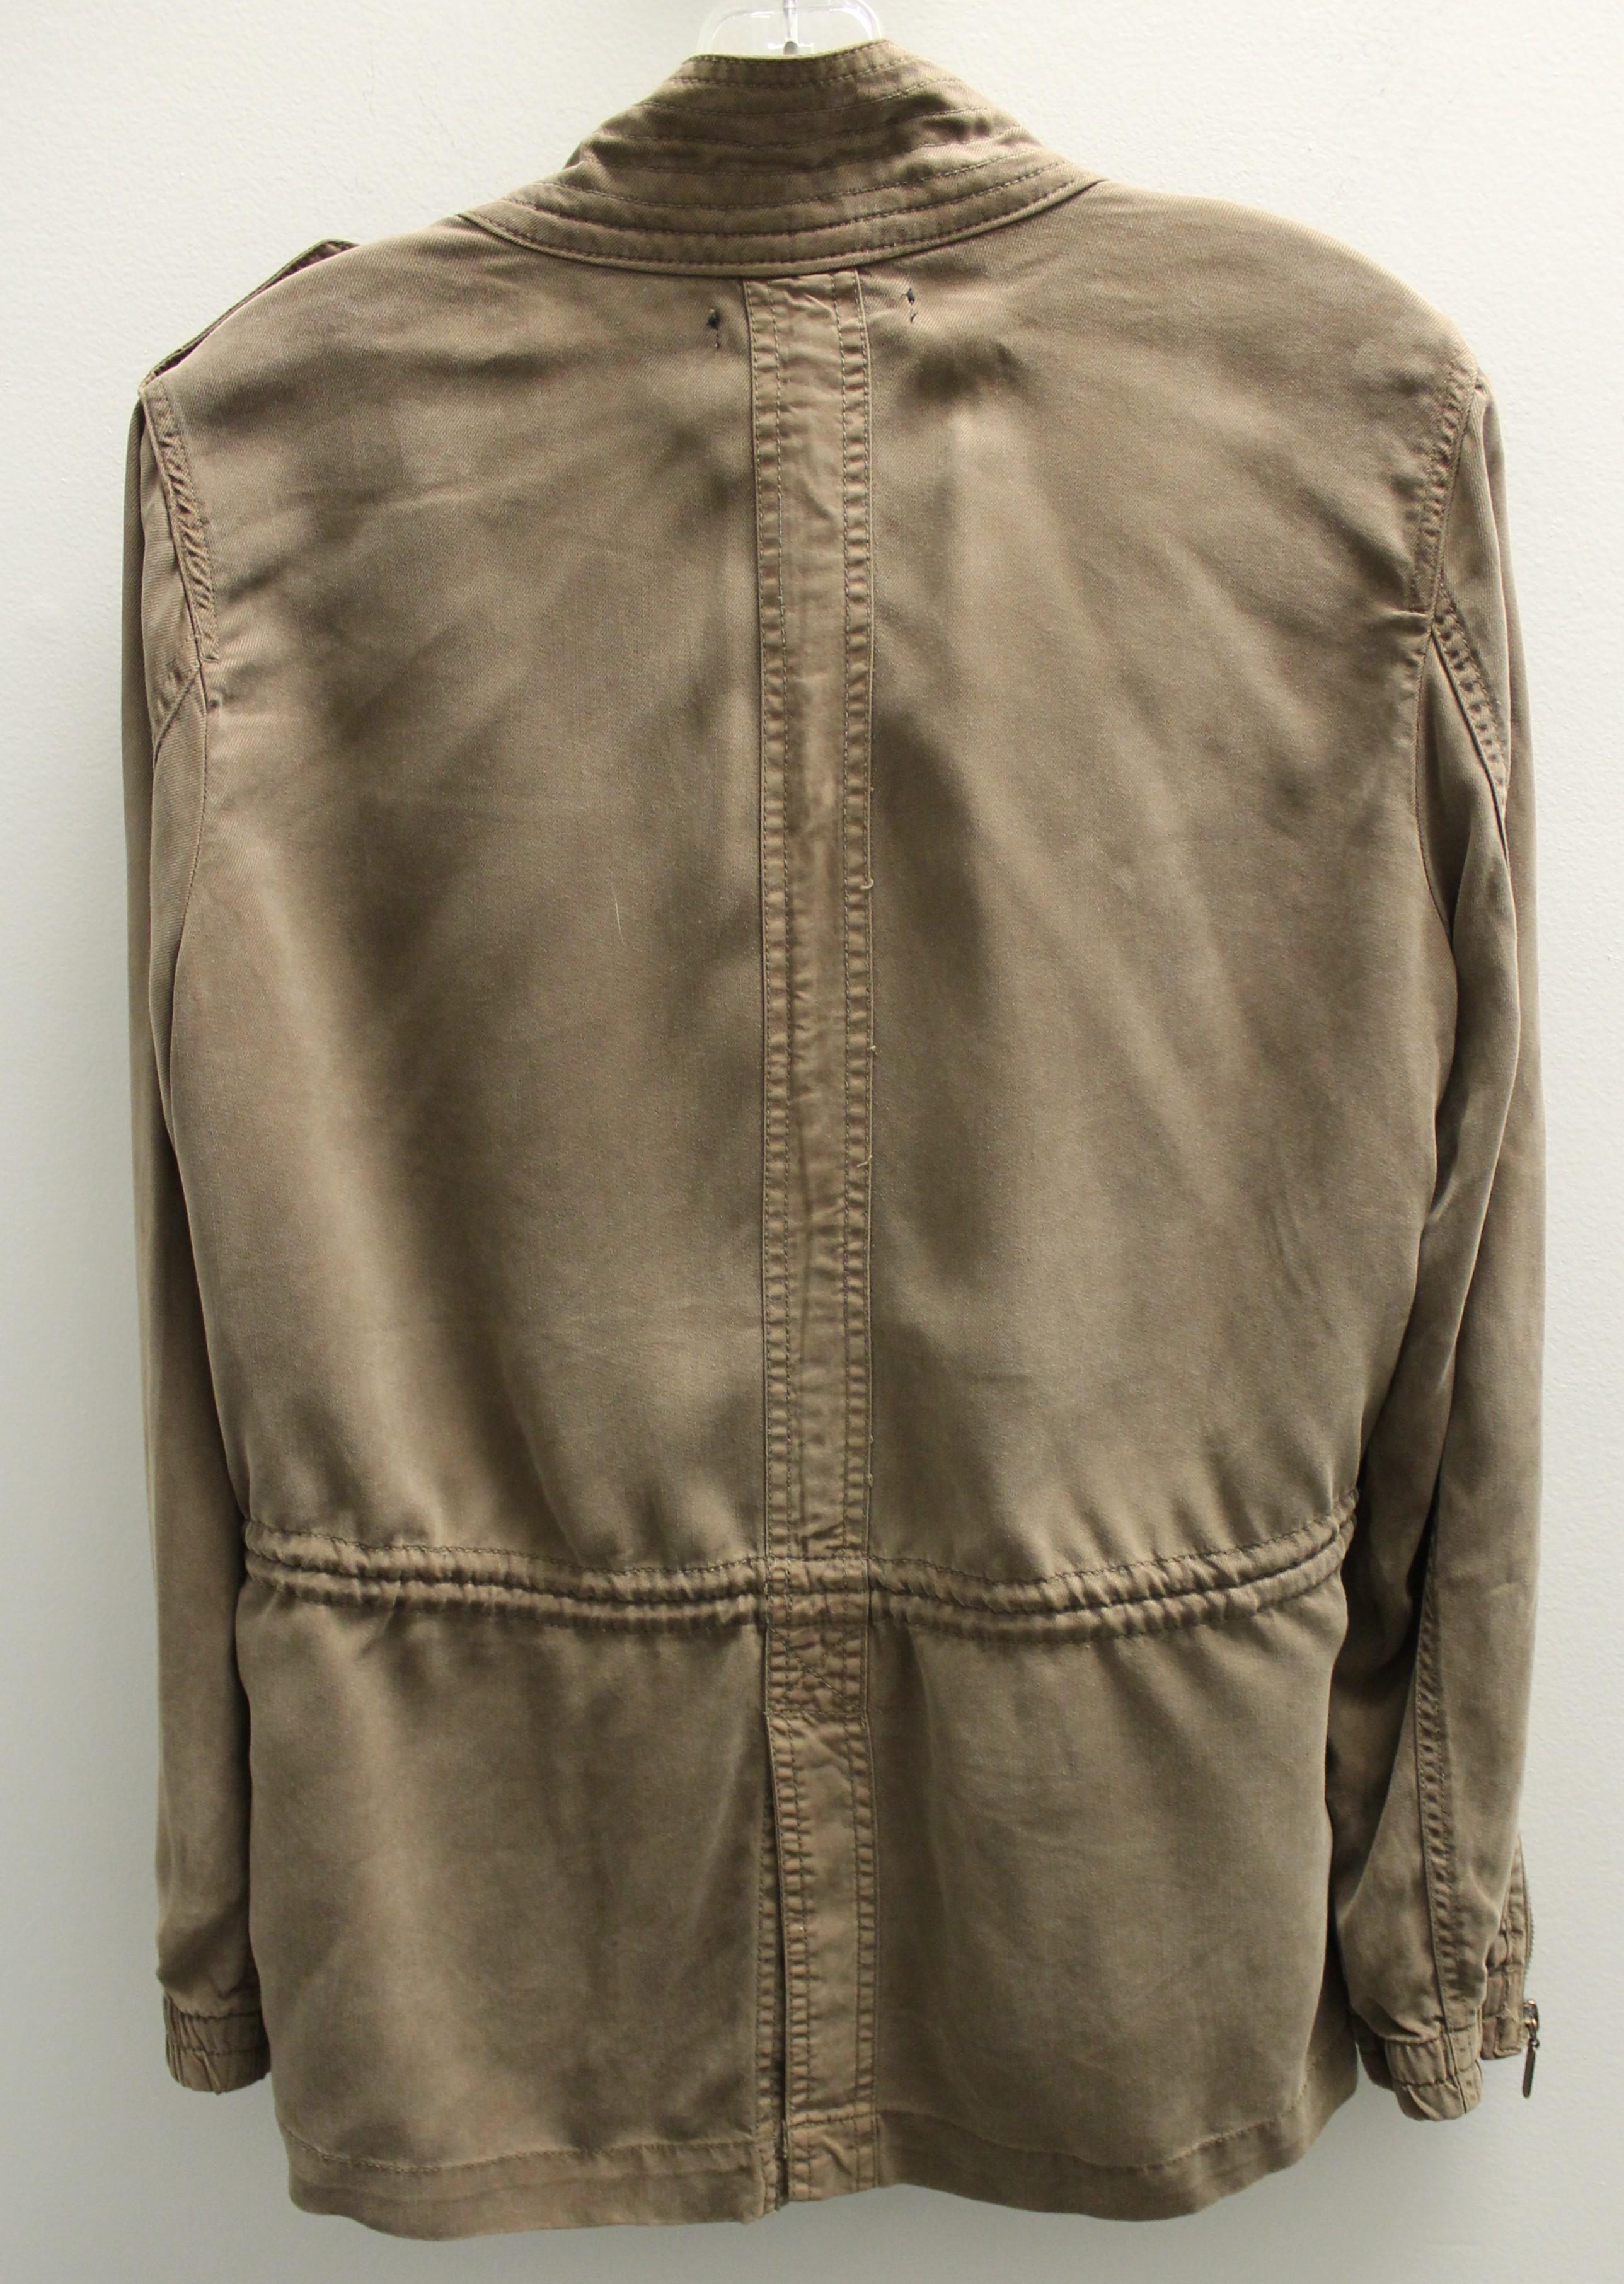 MAX-JEANS-Size-M-810-Brown-Tencel-Solid-Jacket-Outdoor_85035C.jpg